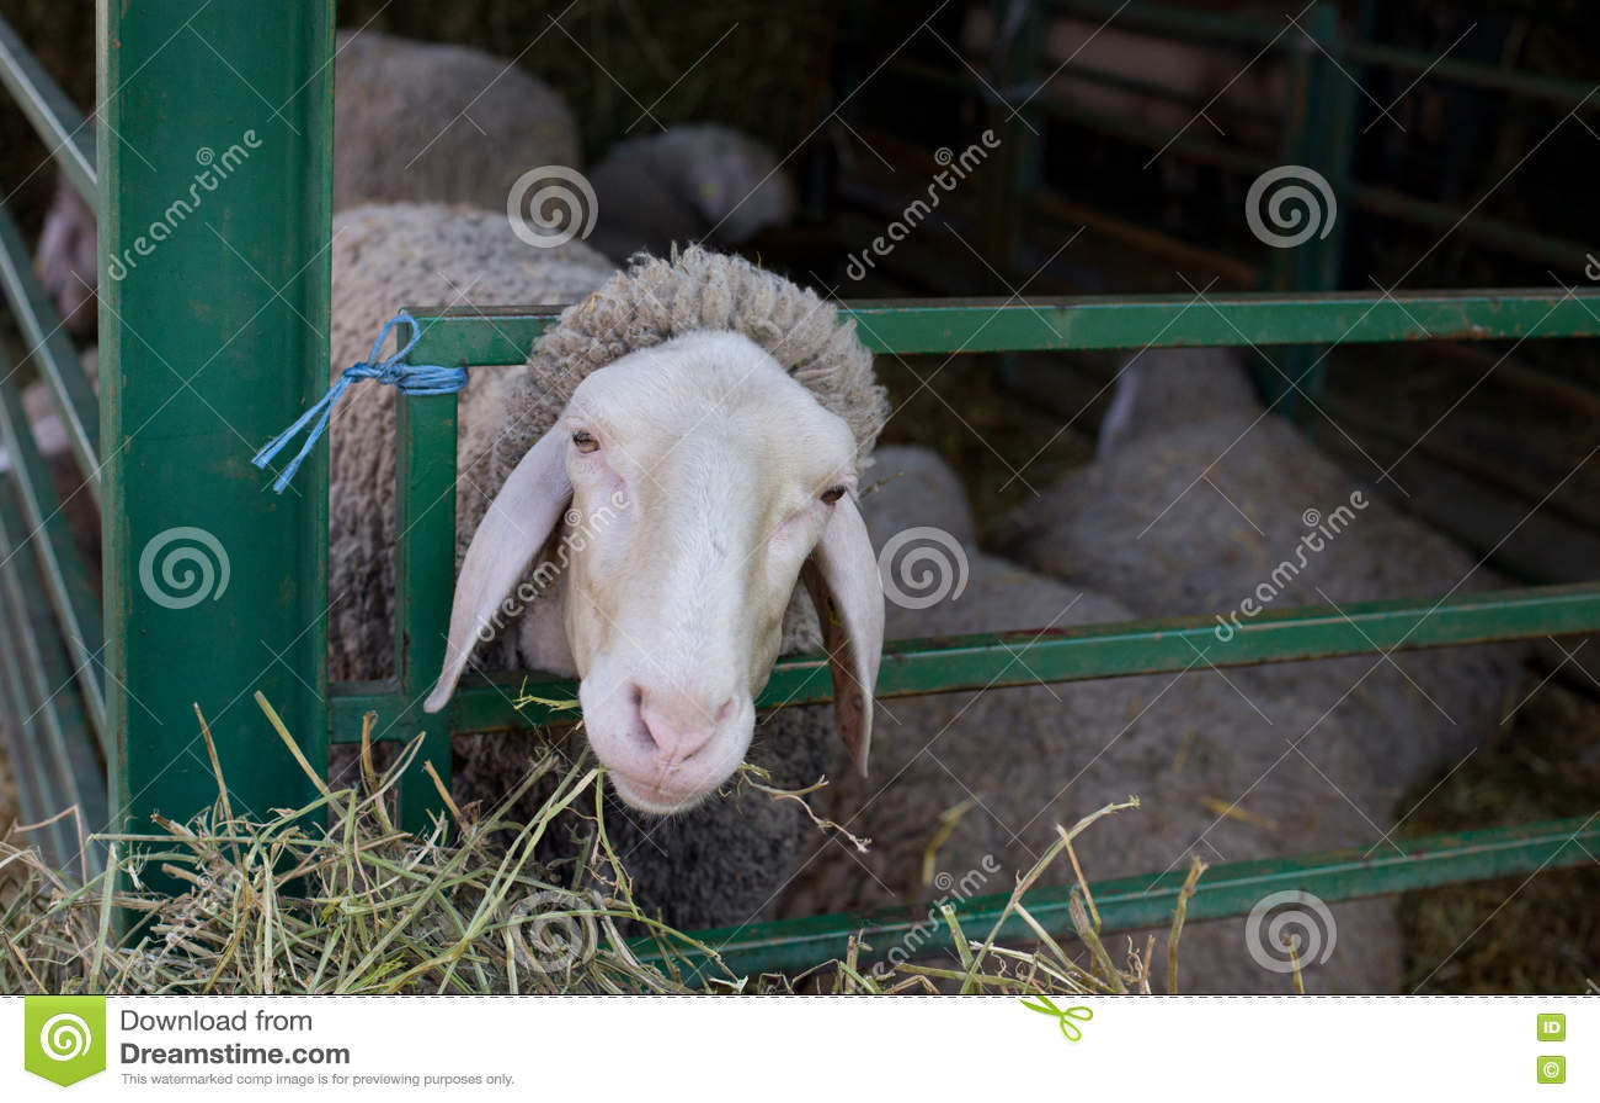 Sheep stuck head in fence